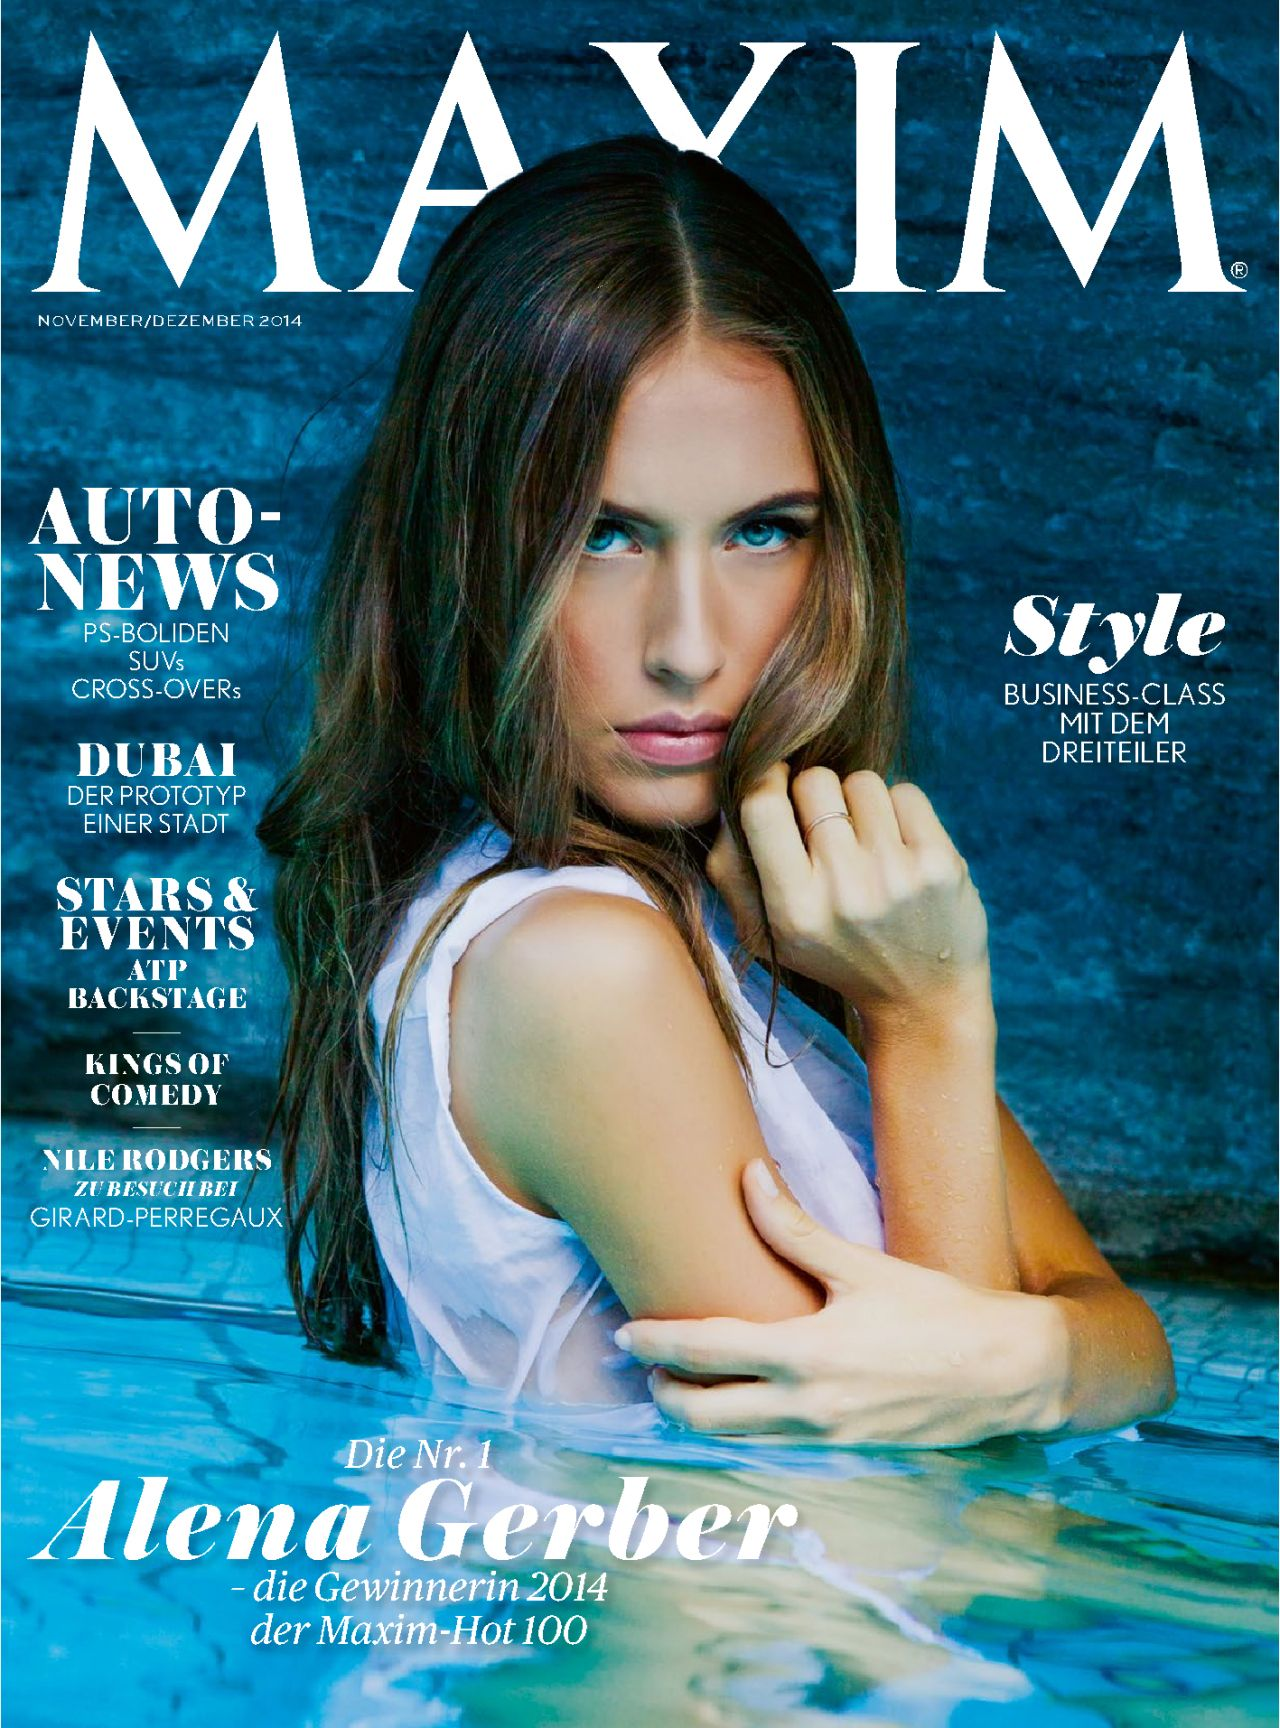 Alena Gerber – Maxim Magazine (Switzerland) November/December 2014 Issue